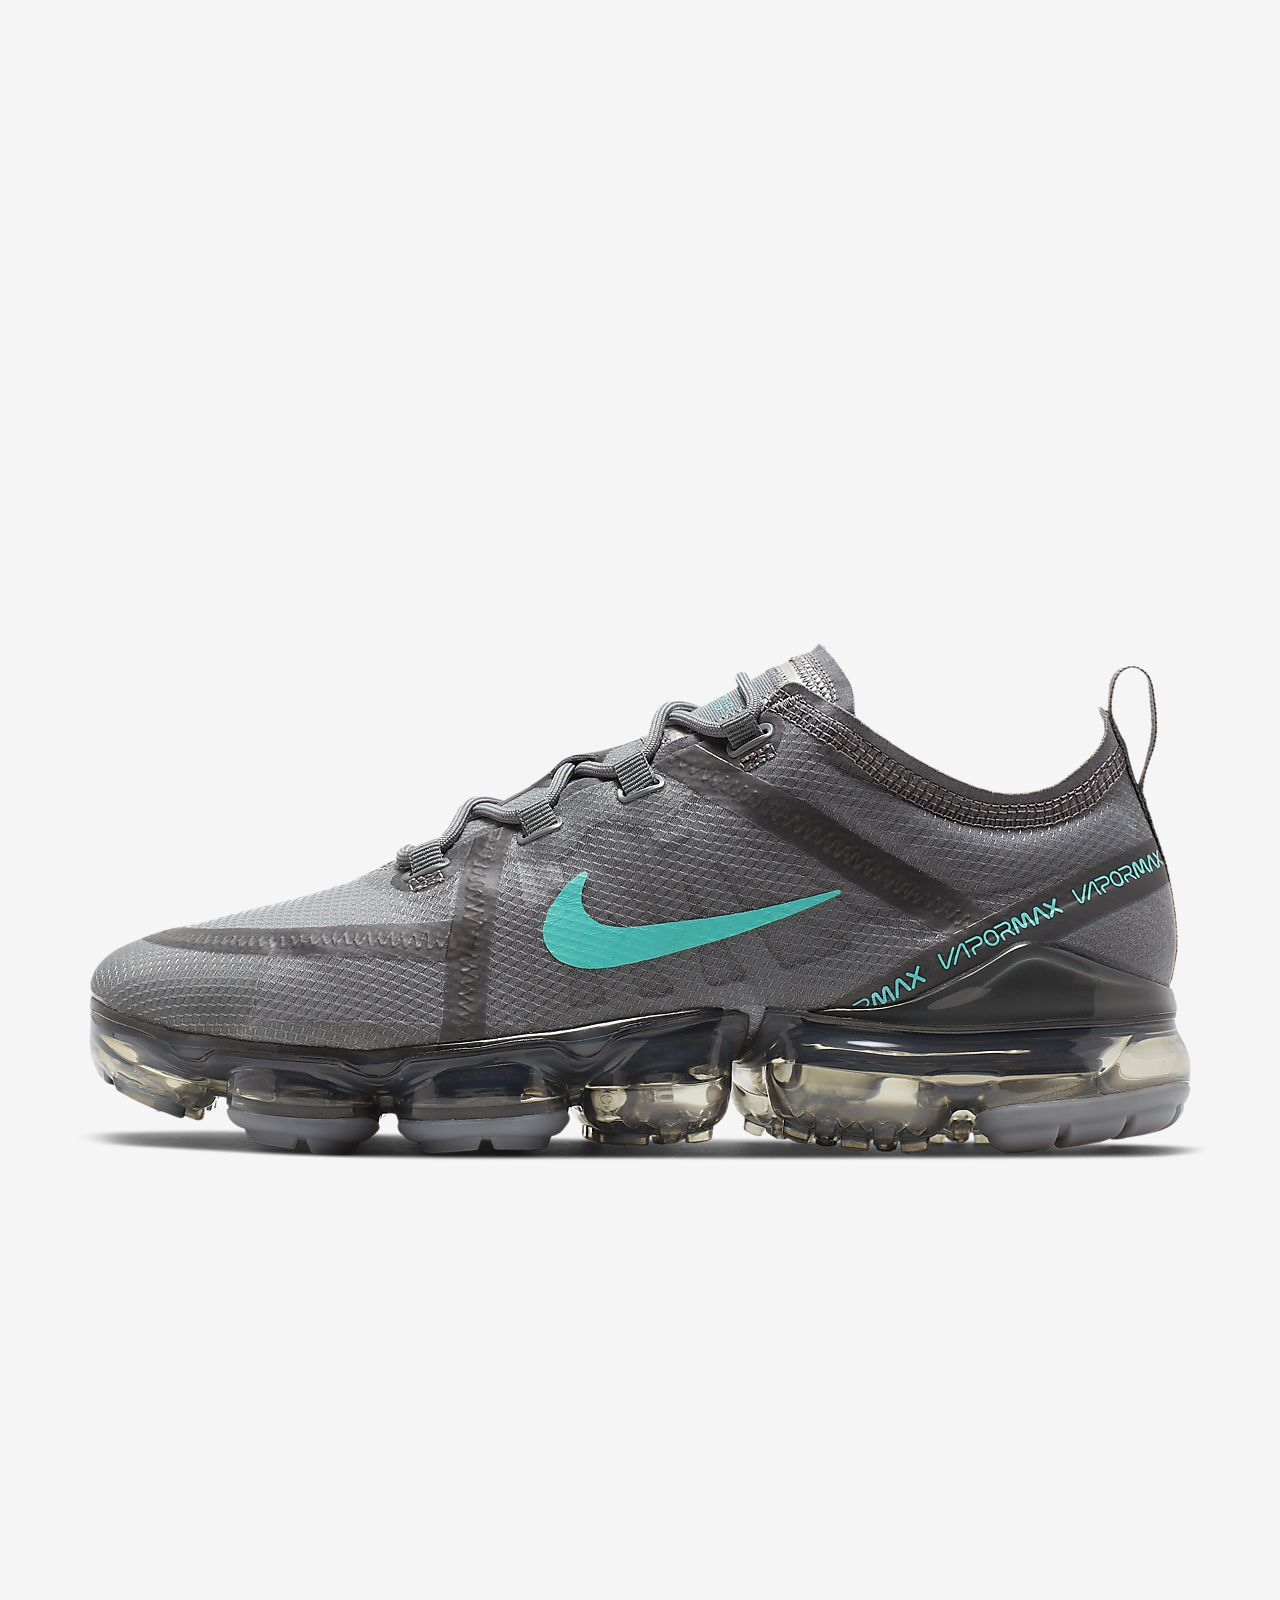 hot sale online a8894 f3a26 Scarpa Nike Air VaporMax 2019 , Uomo ...